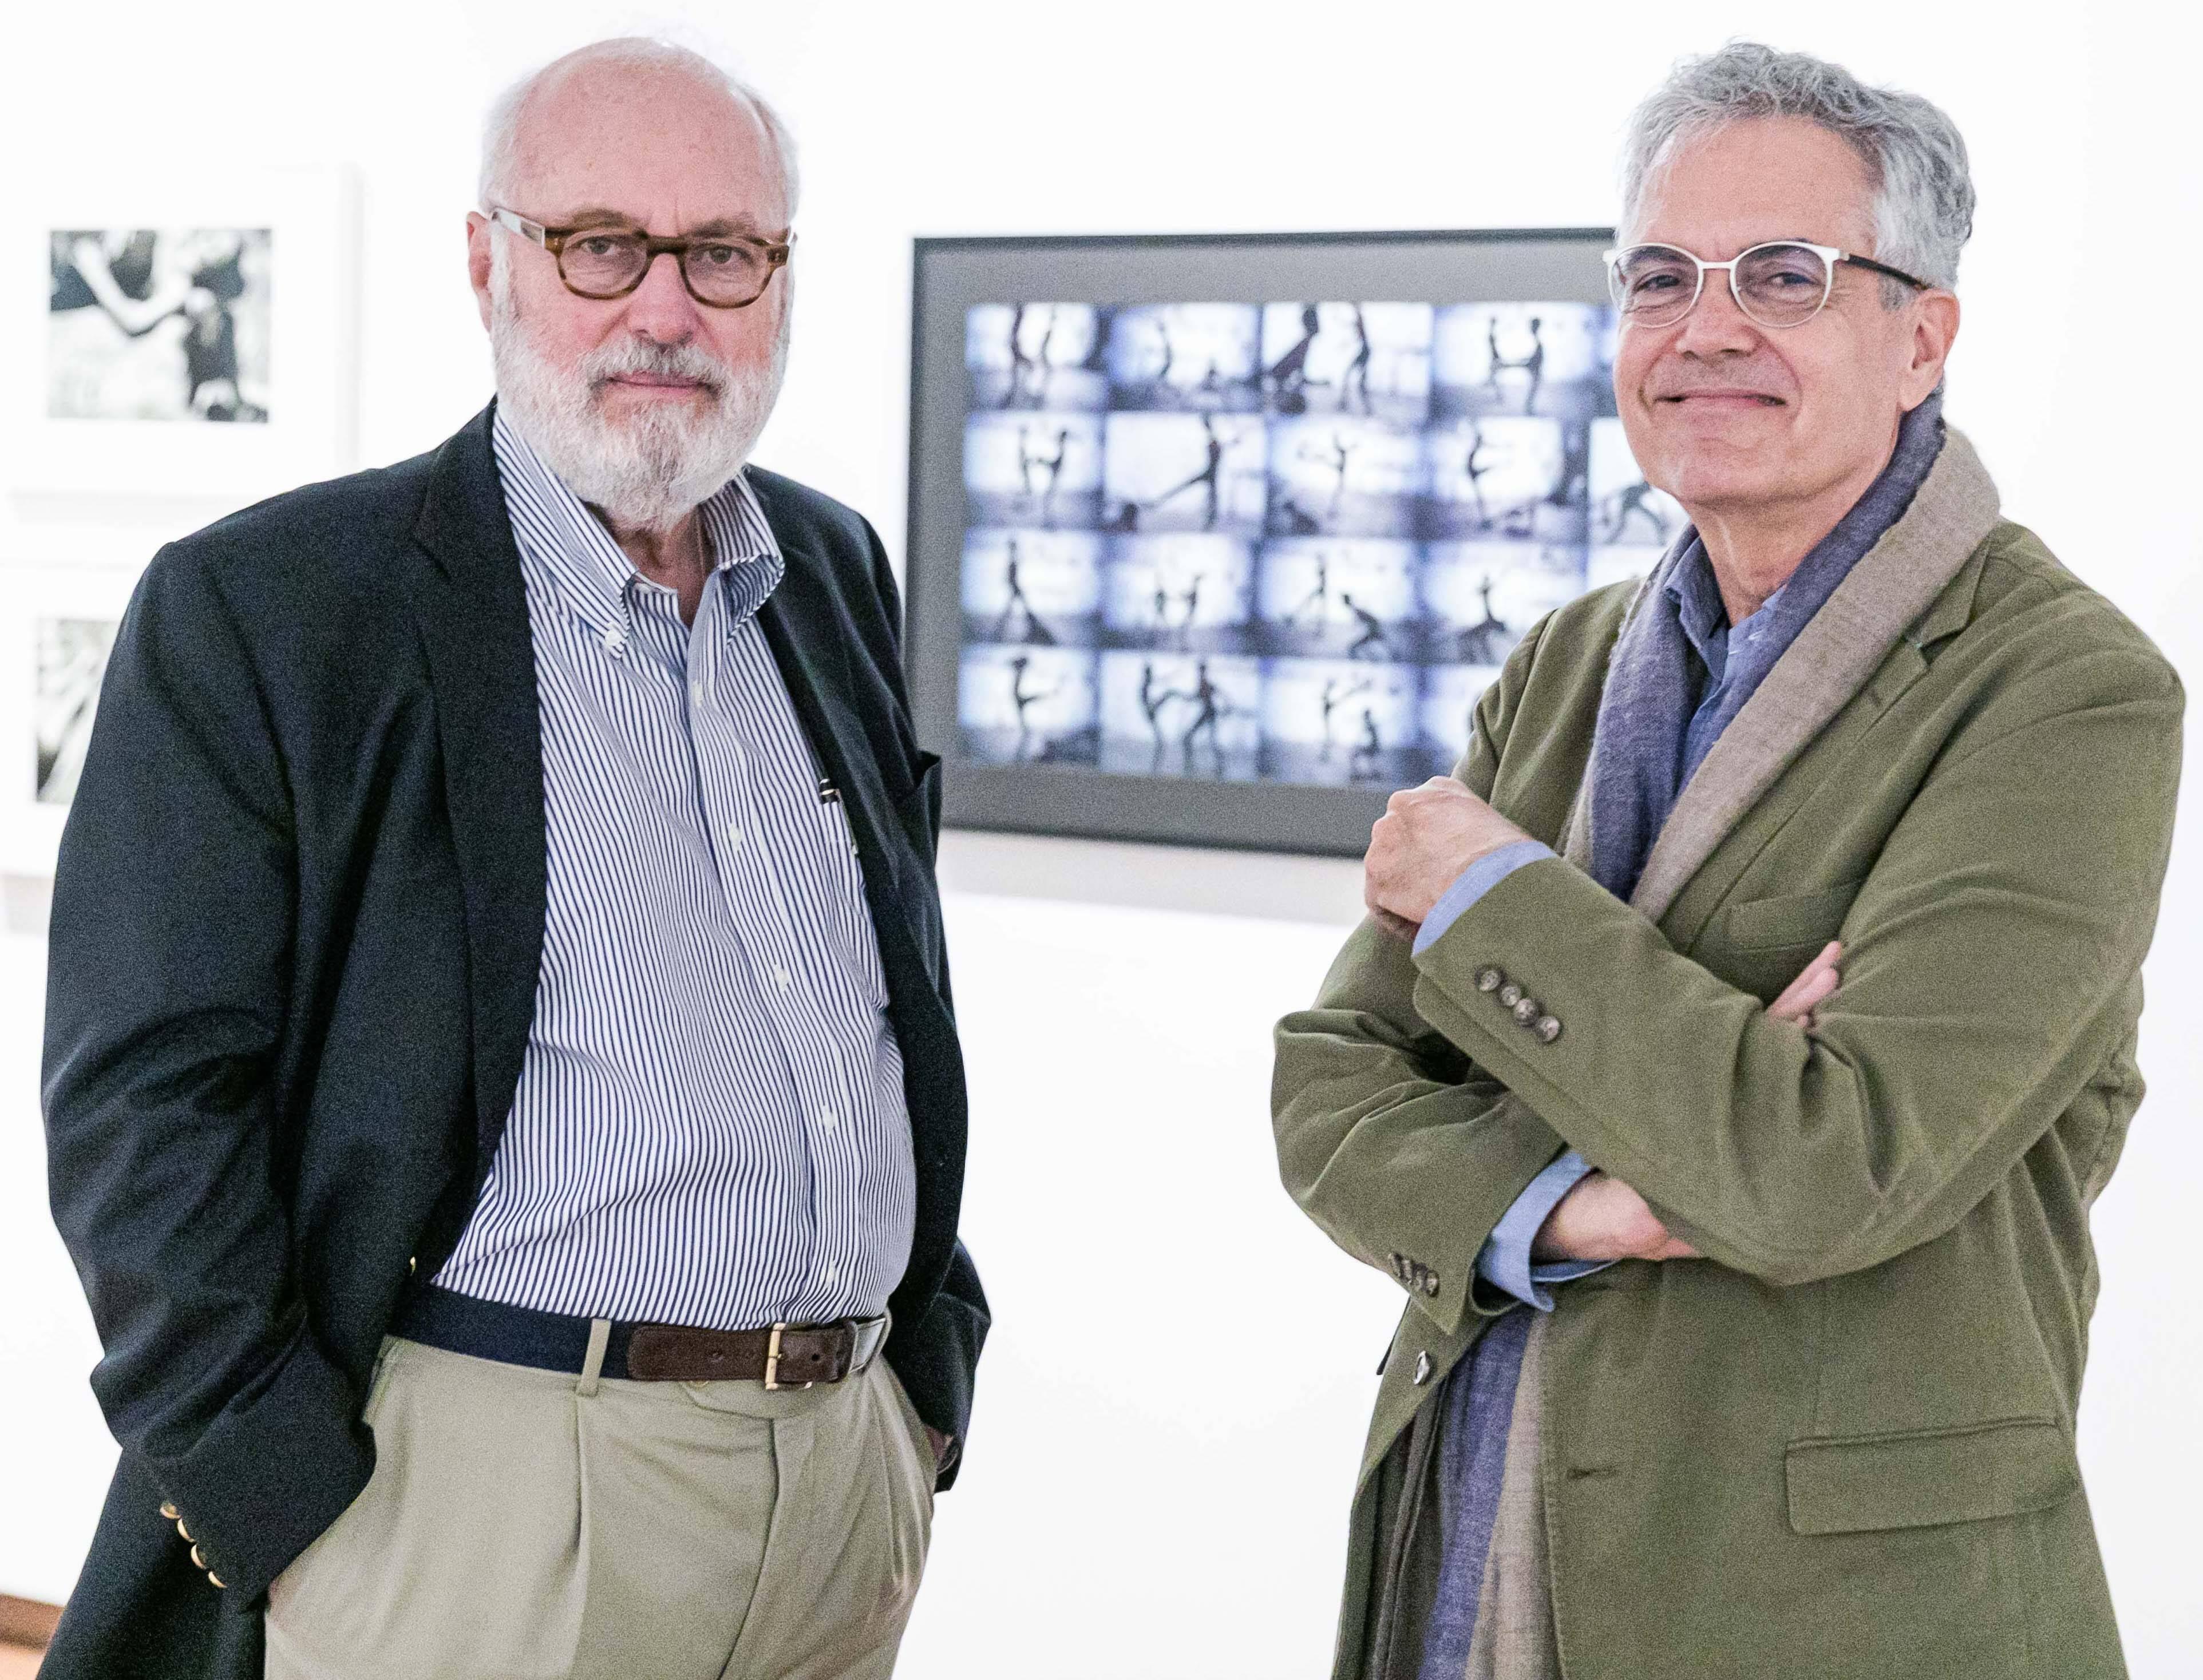 Pedro Carvalho e Lauro Cavalcanti / Foto: Miguel Sá